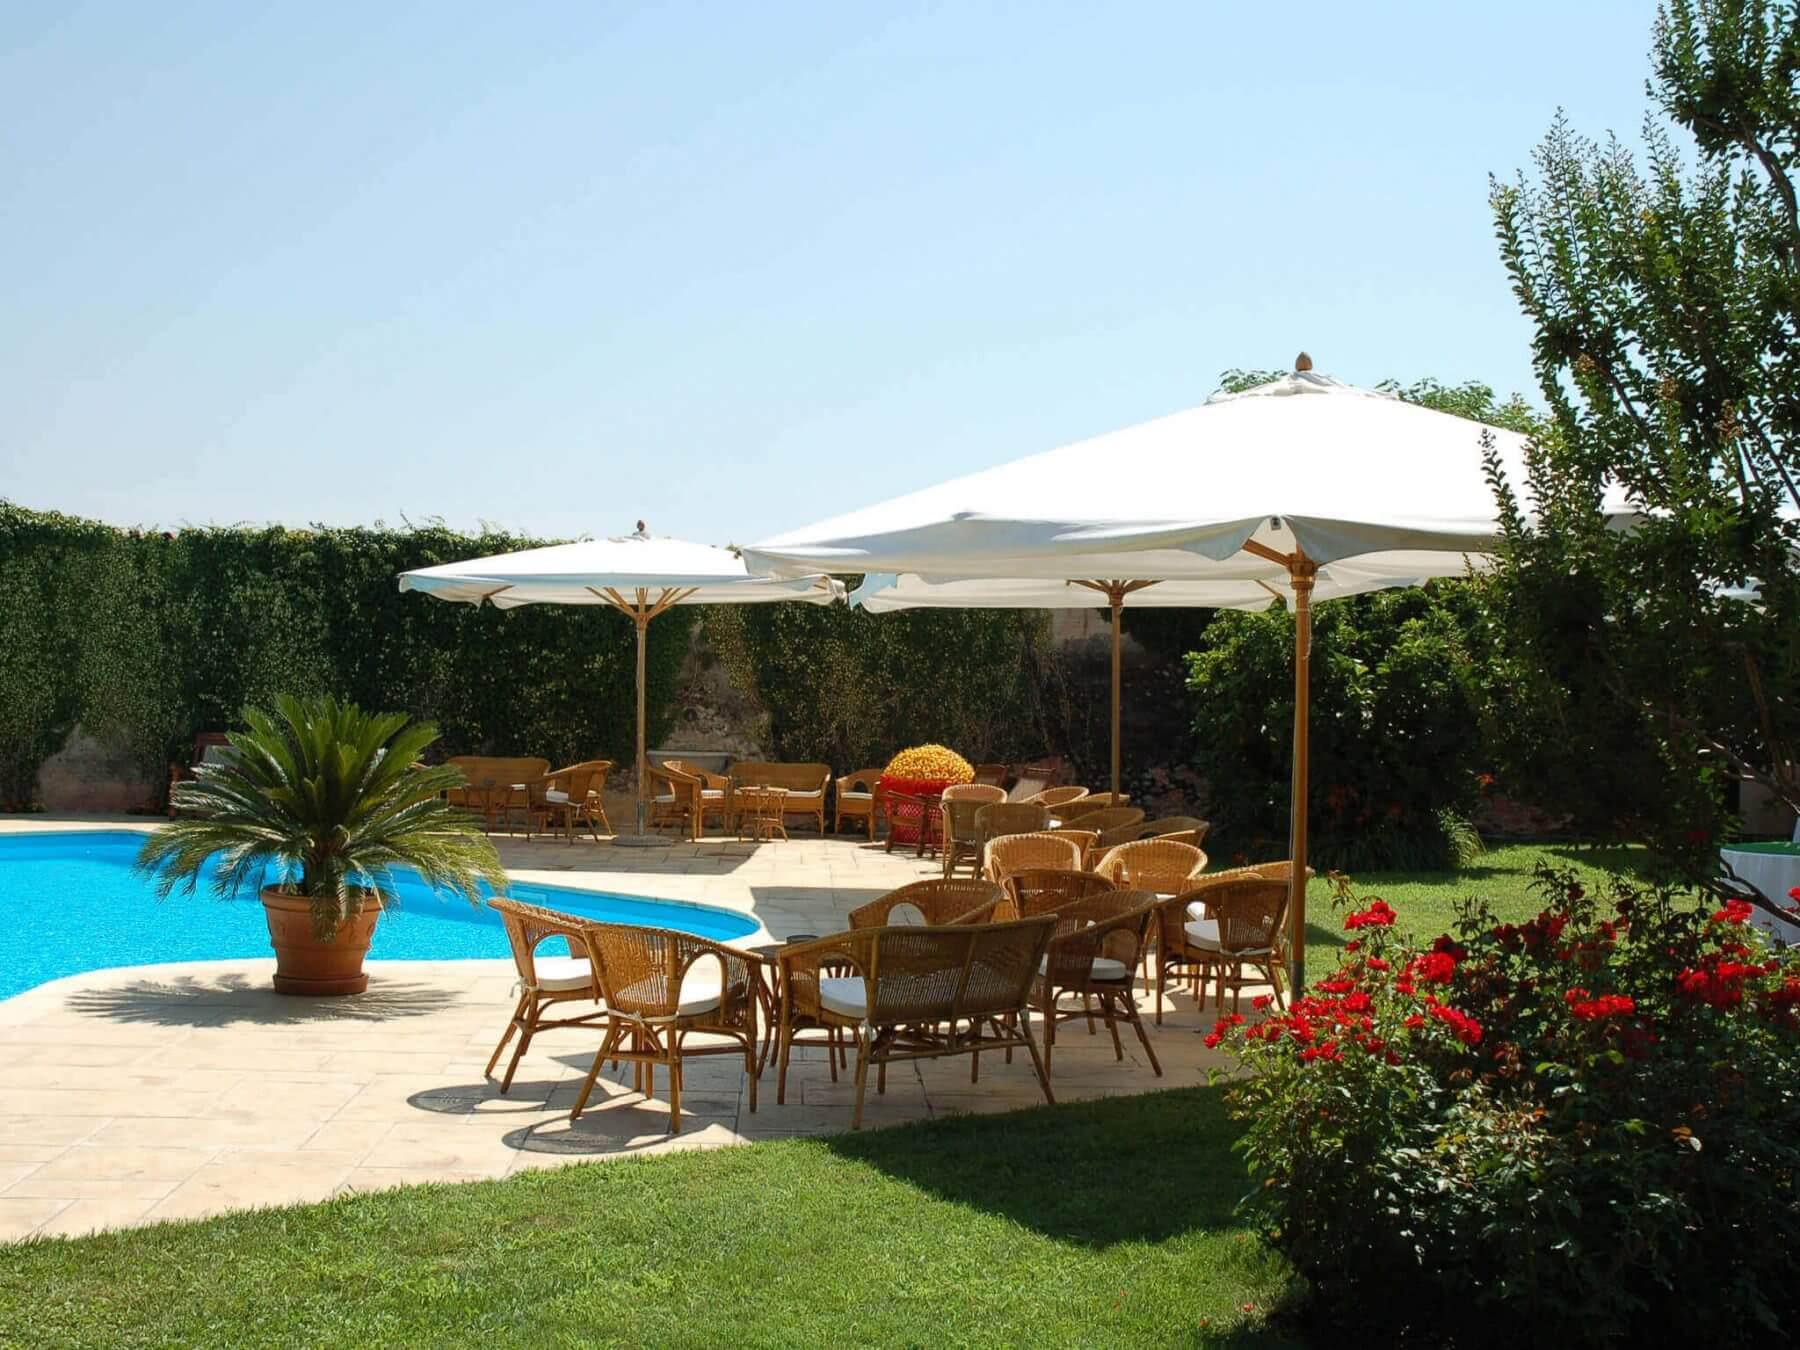 Noleggio ombrelloni in legno e tessuto per eventi puntonoleggio - Noleggio tavoli e sedie per feste catania ...